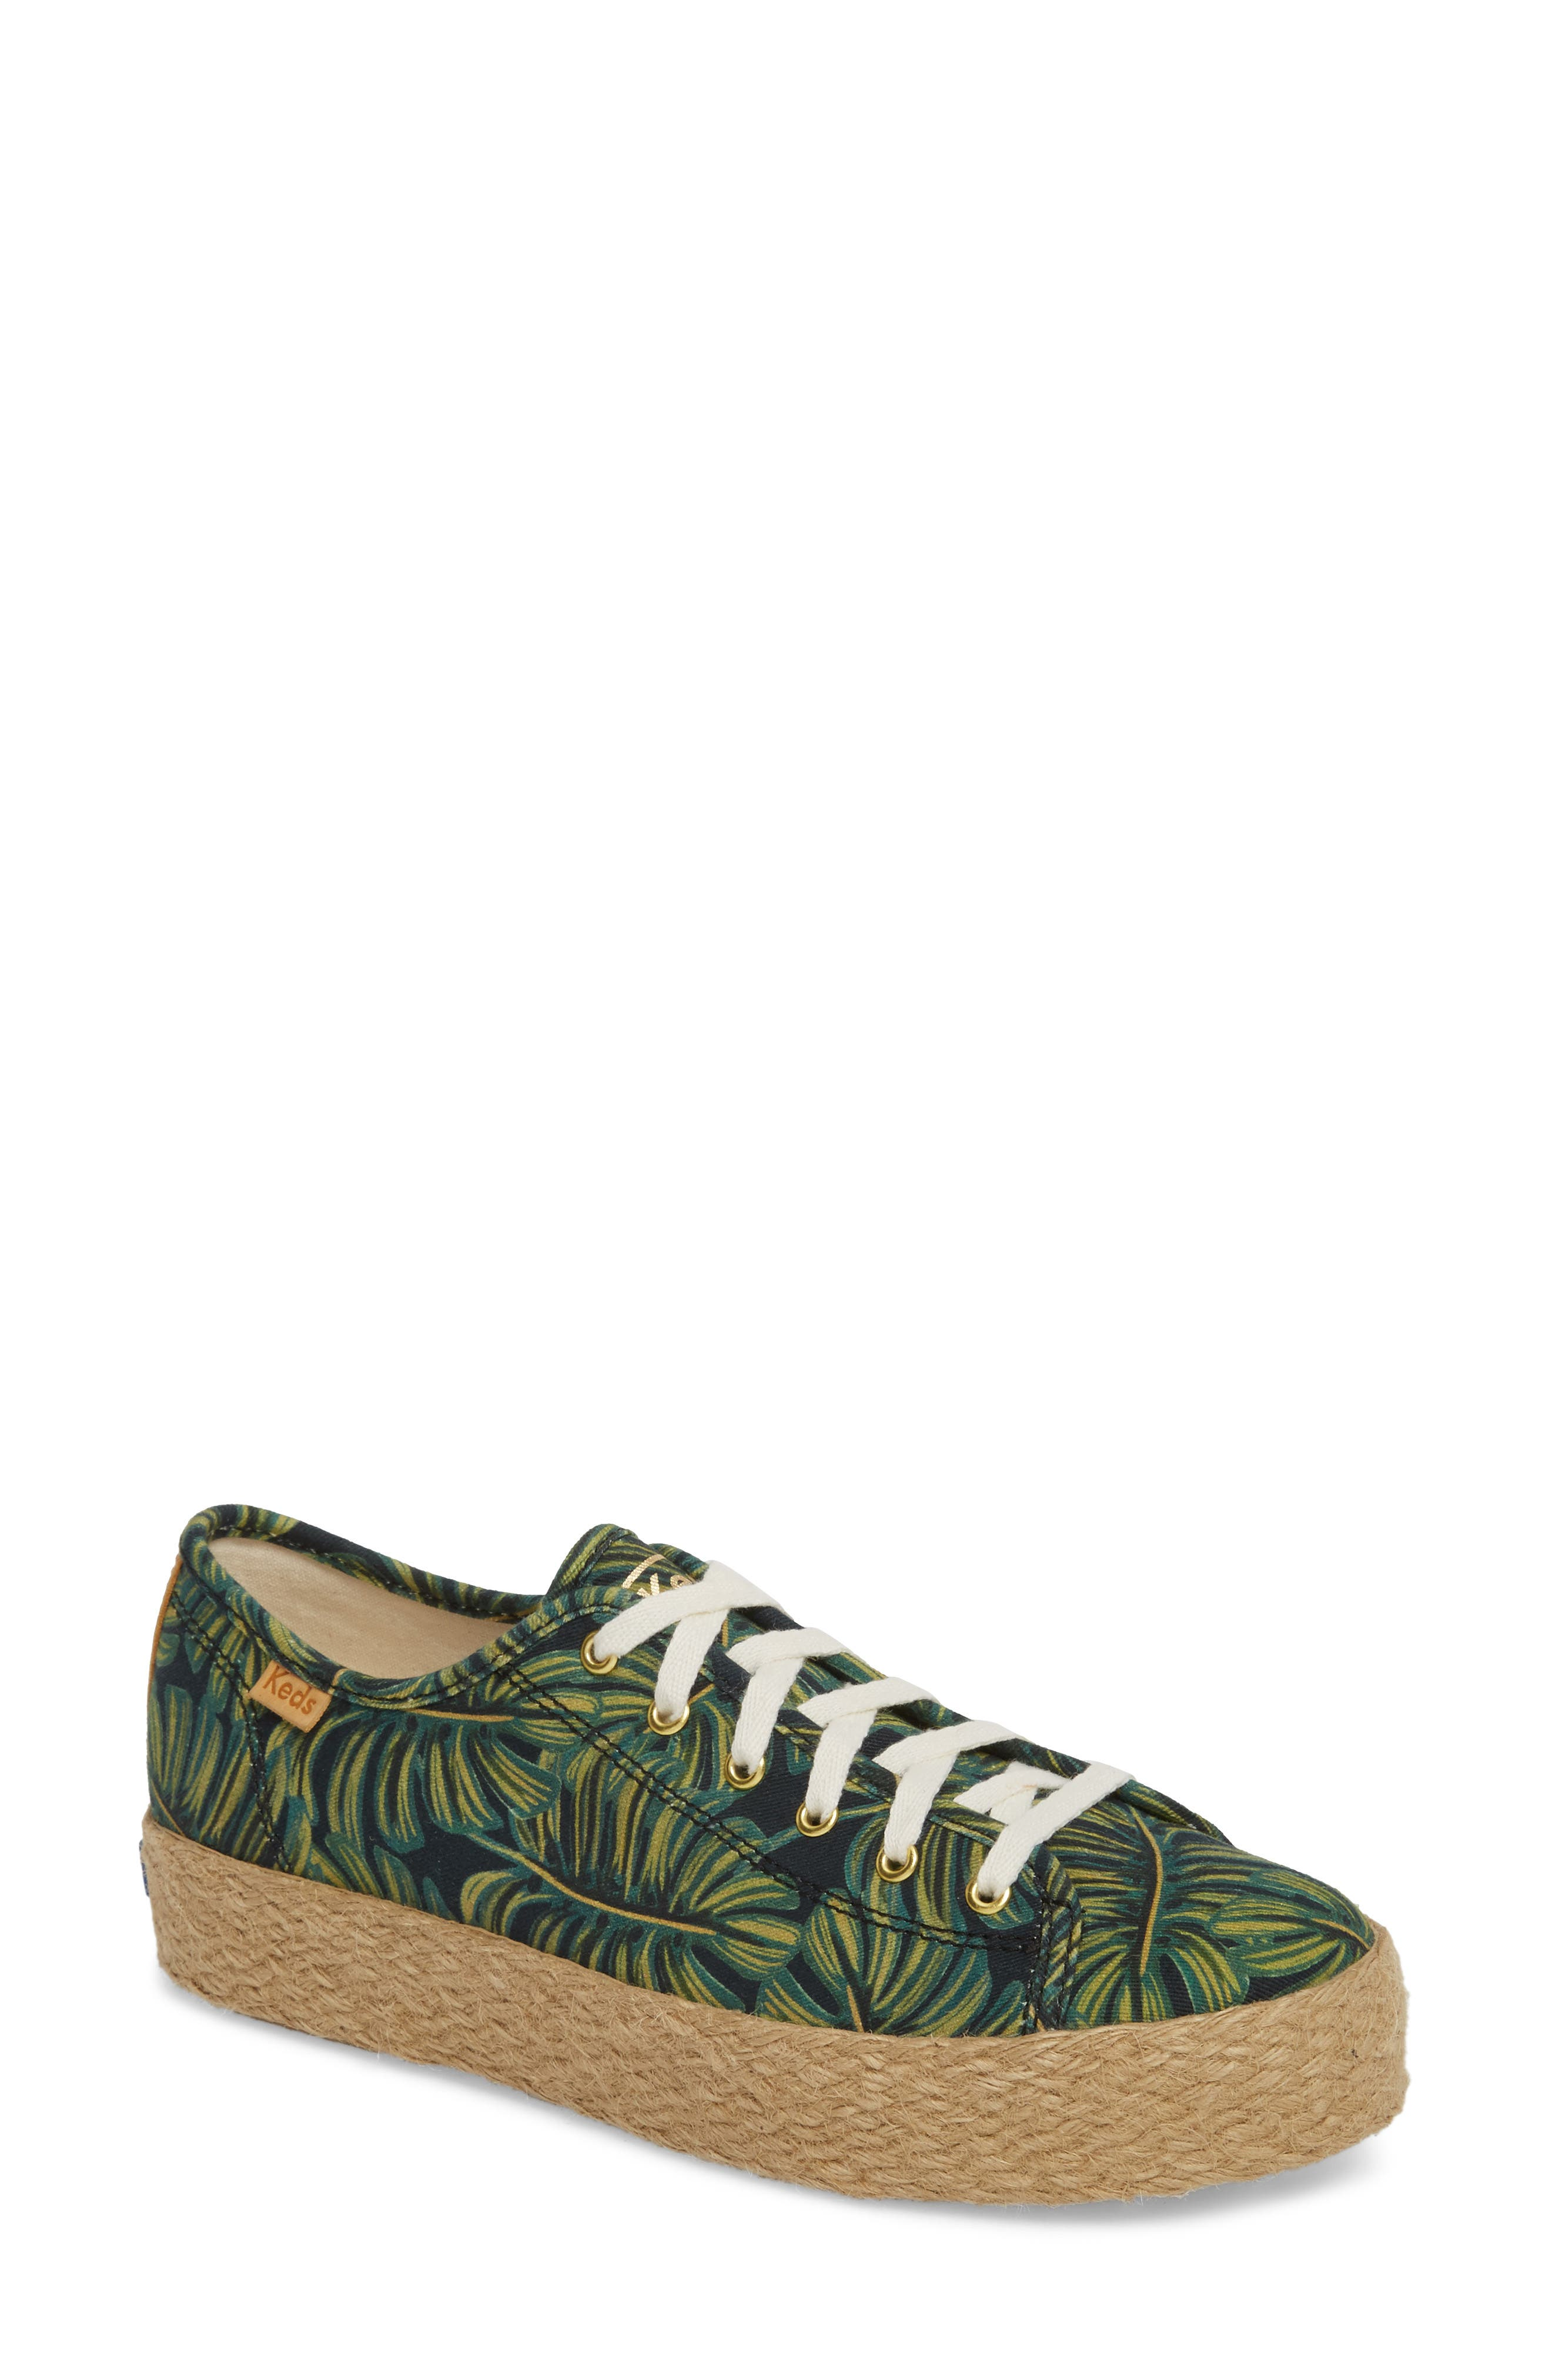 KEDS<SUP>®</SUP>, x Rifle Paper Co. Triple Kick Palms Platform Sneaker, Main thumbnail 1, color, 001